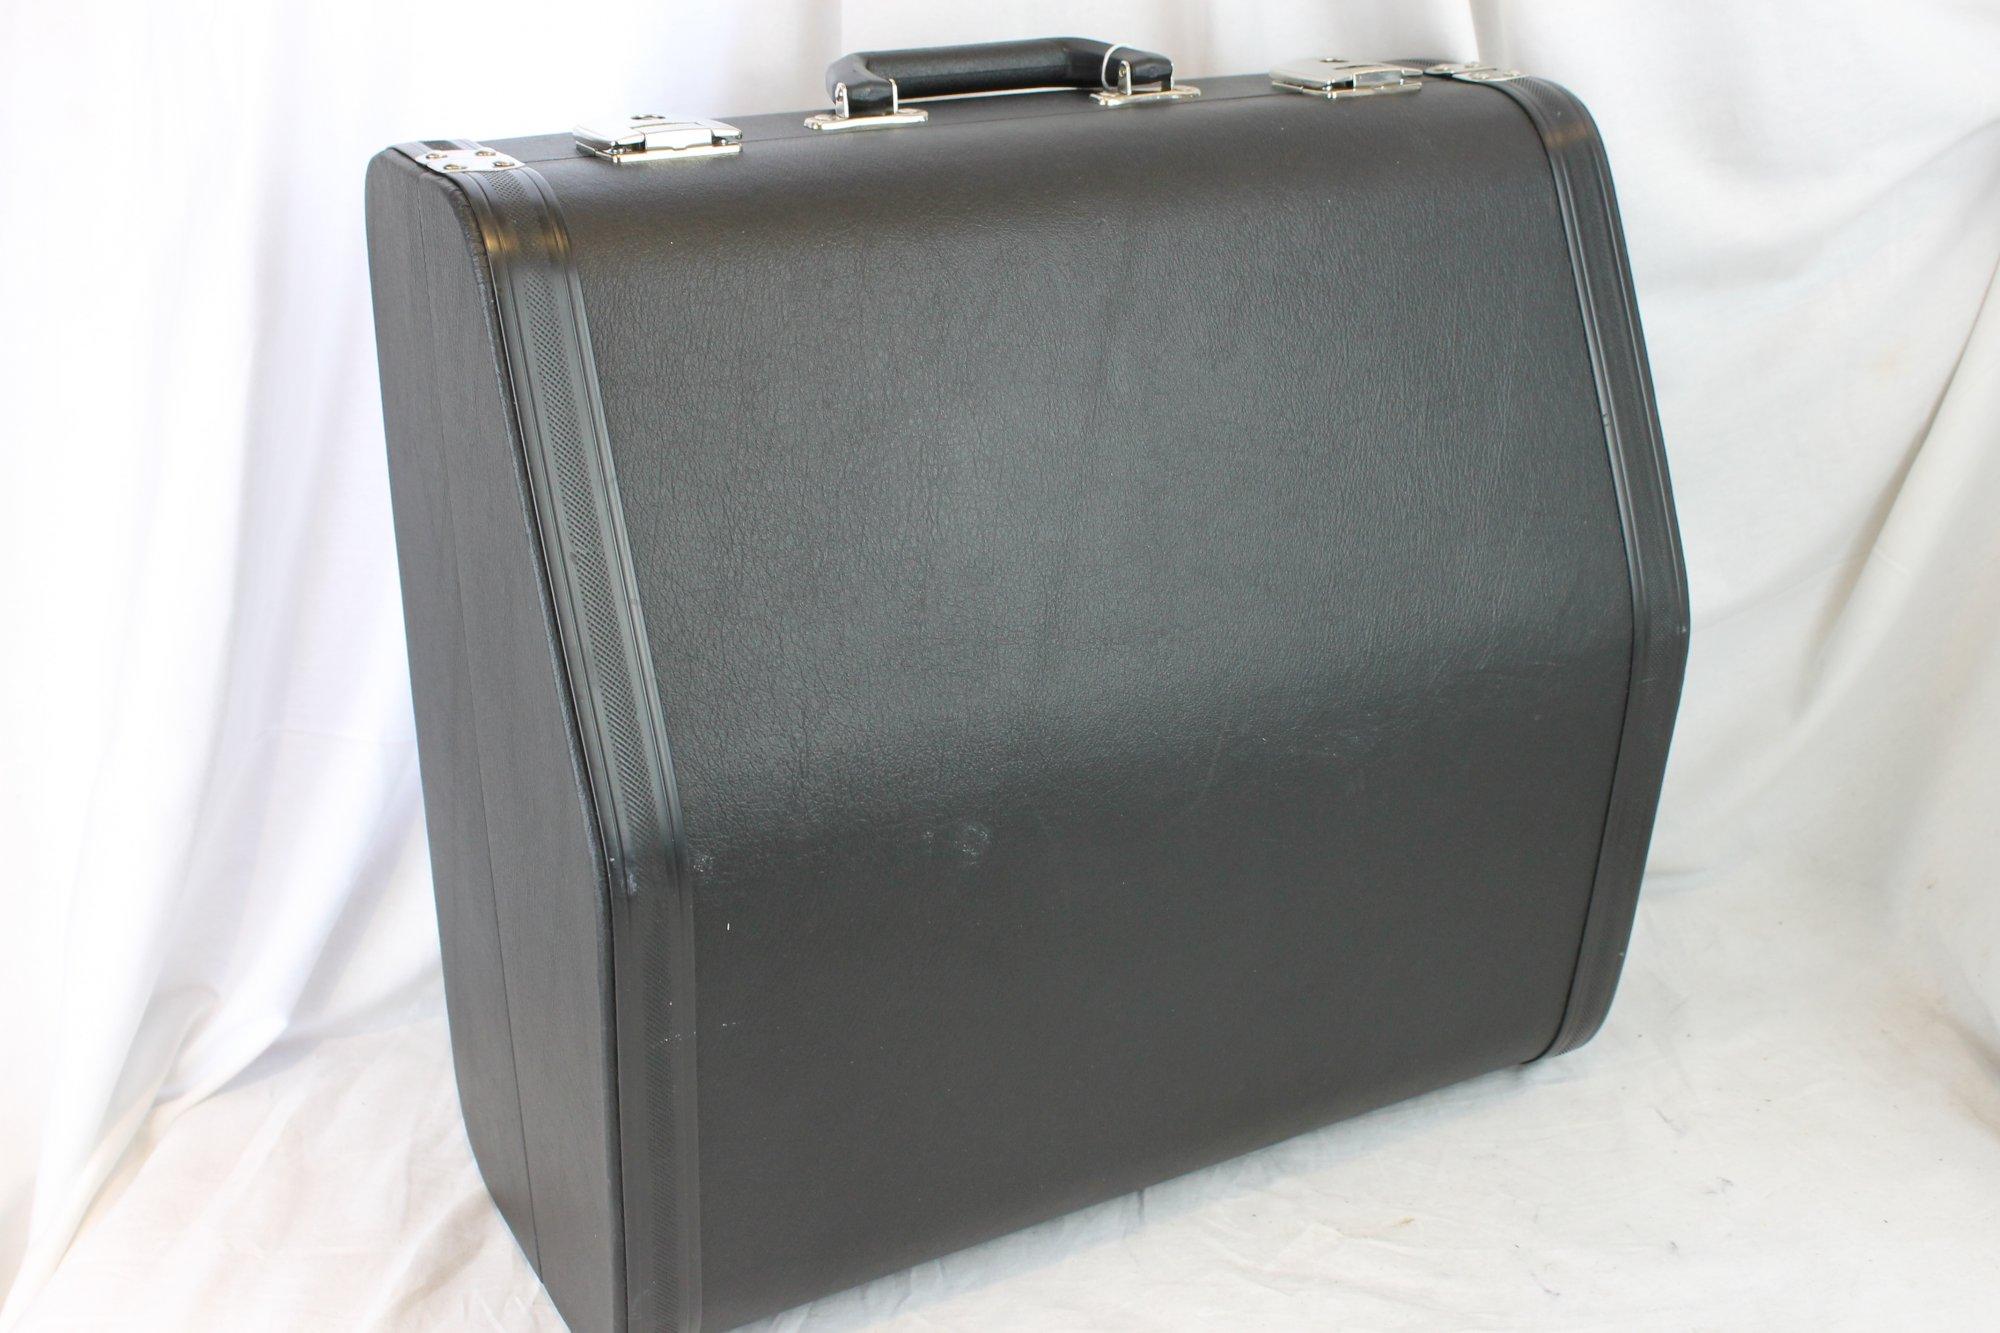 NEW Black Weltmeister Accordion Hard Case 16.5 x 16 x 9 (42cm x 40.5cm x 23cm)